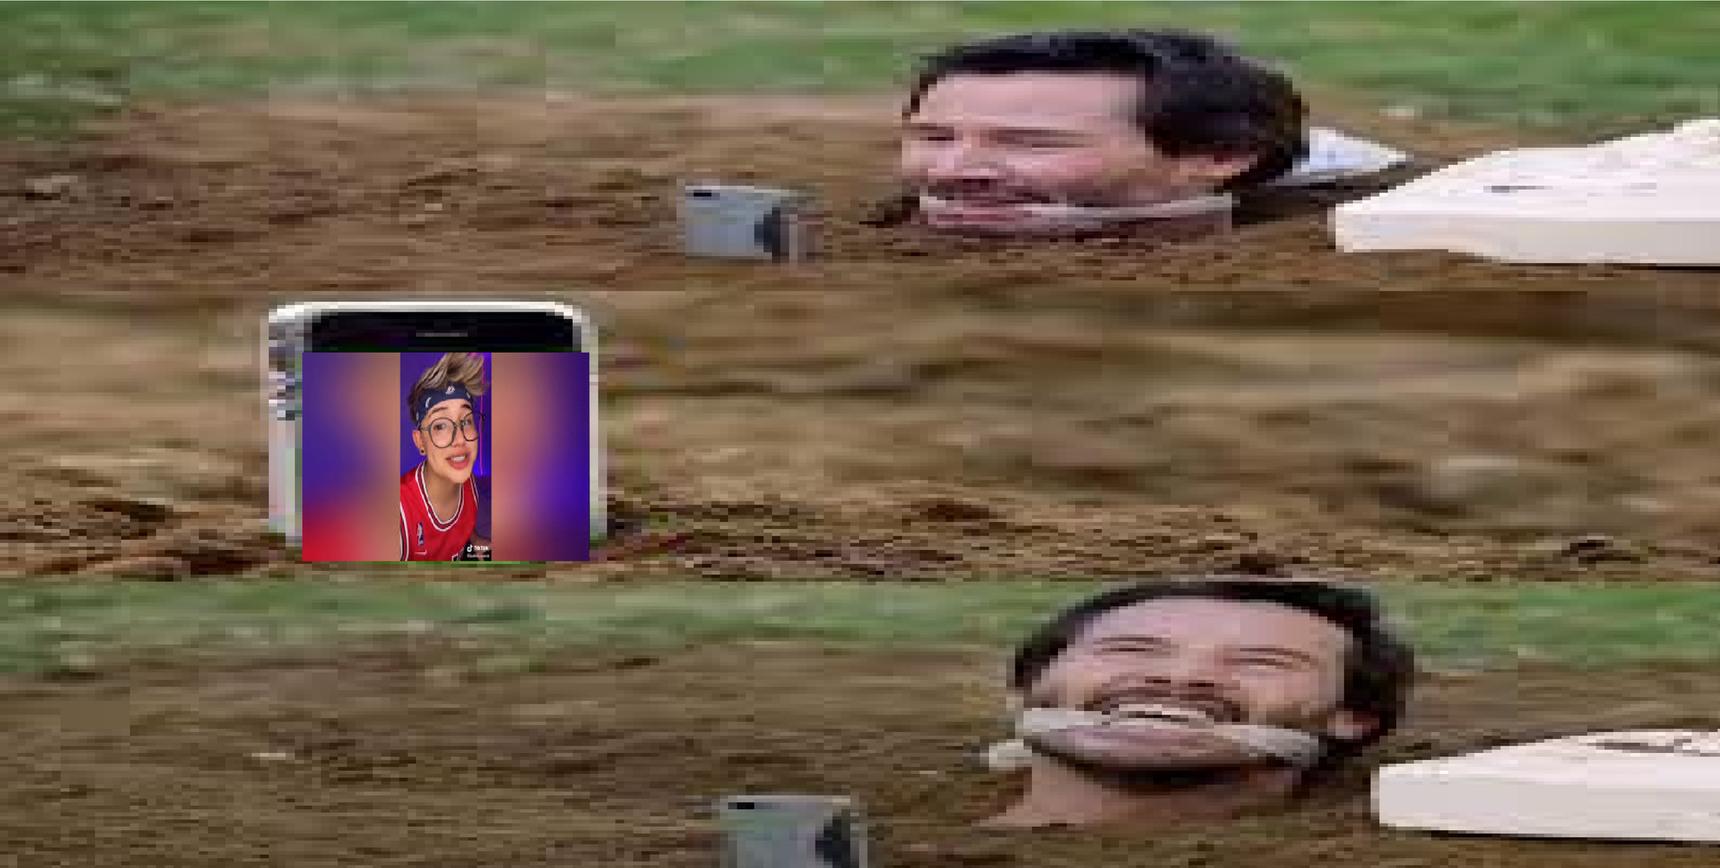 potentisimo el pixel art - meme